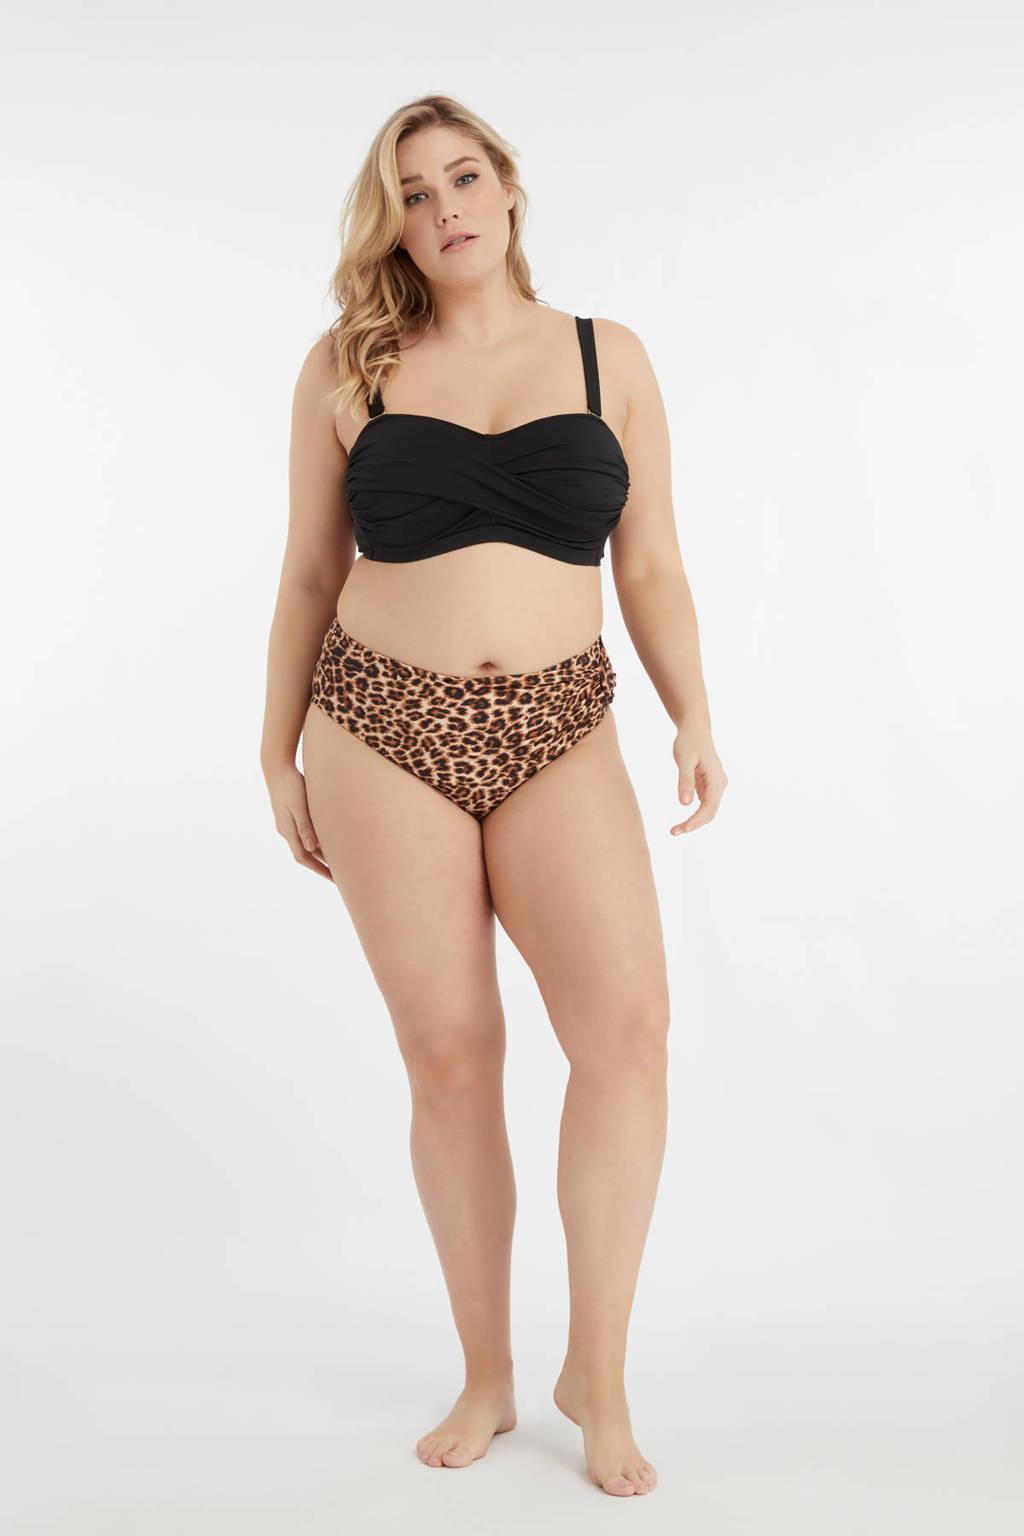 MS Mode bikinibroekje met panterprint bruin/zwart, Bruin/zwart